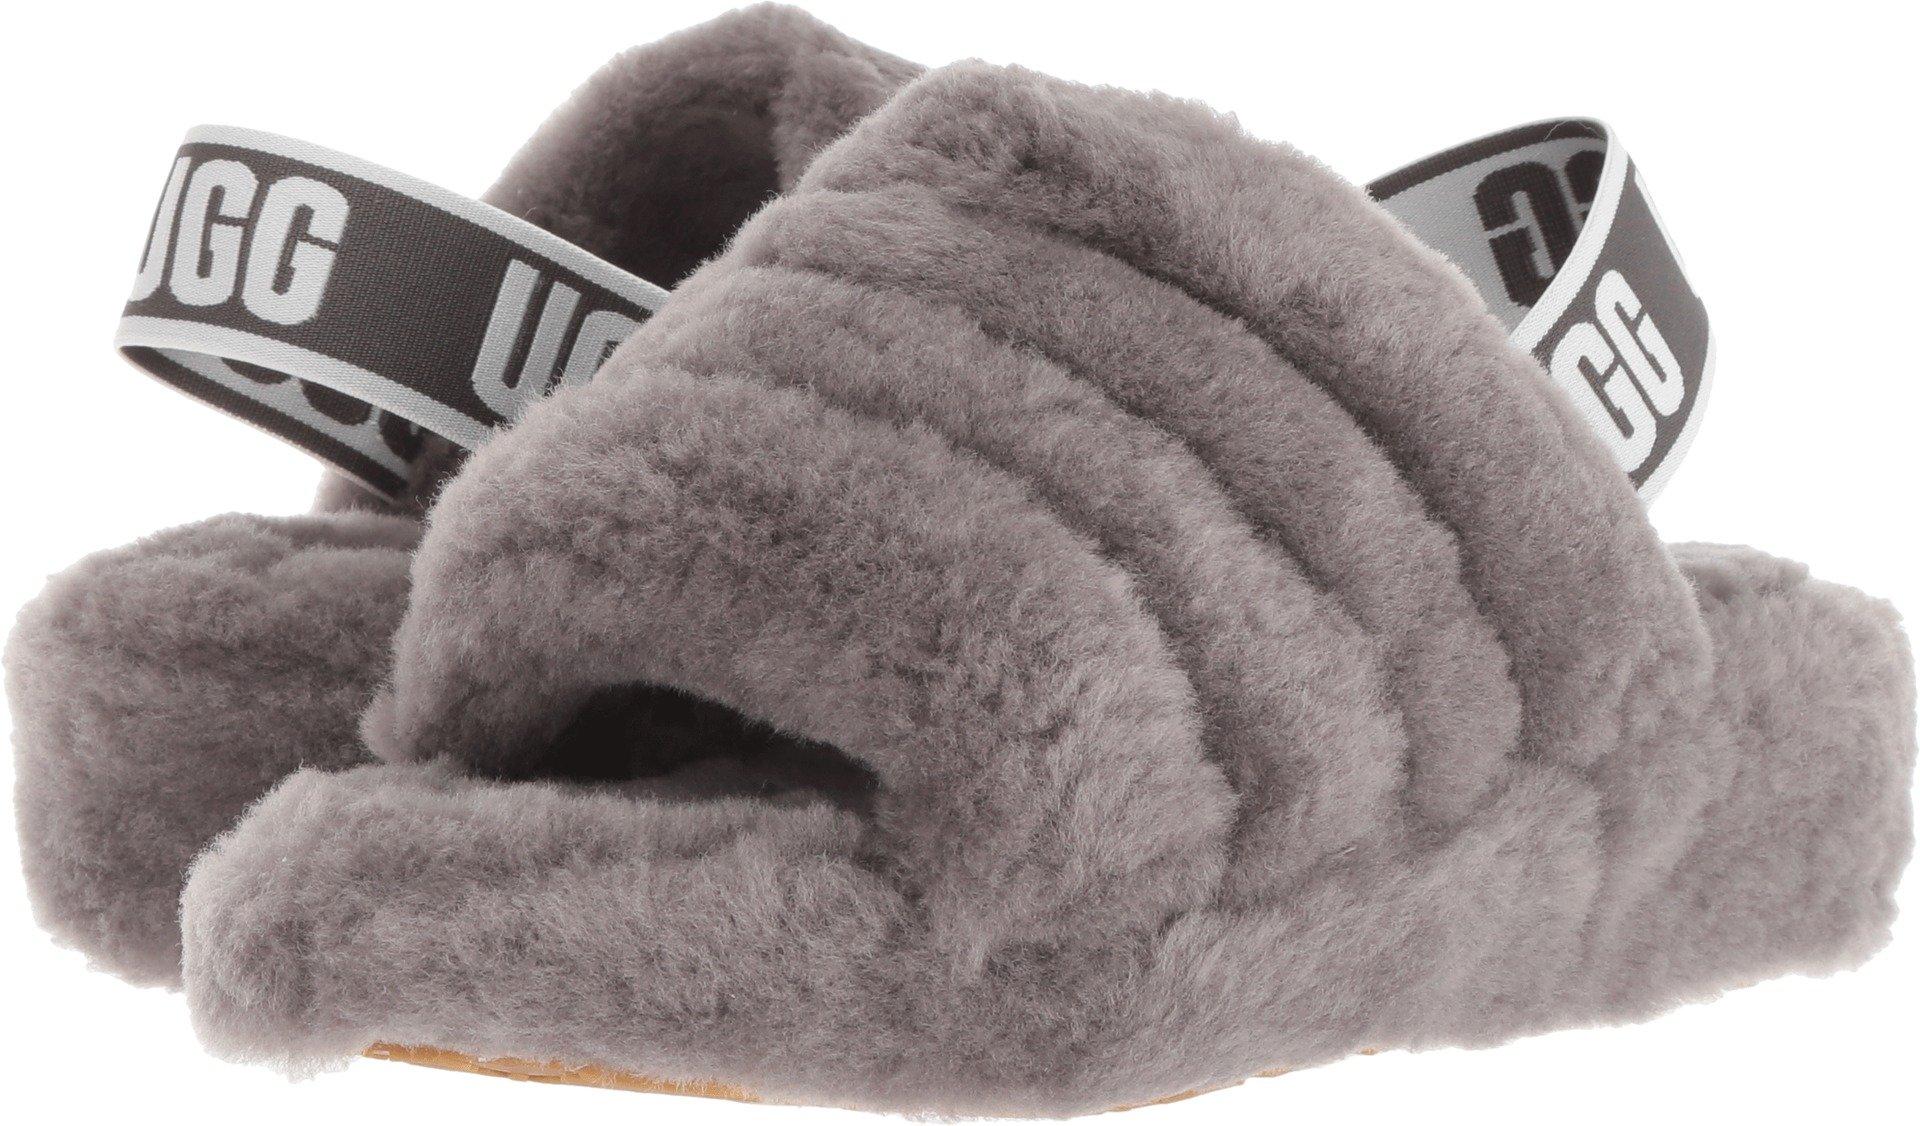 UGG Women's Fluff Yeah Slide Sandal, Charcoal, 7 M US